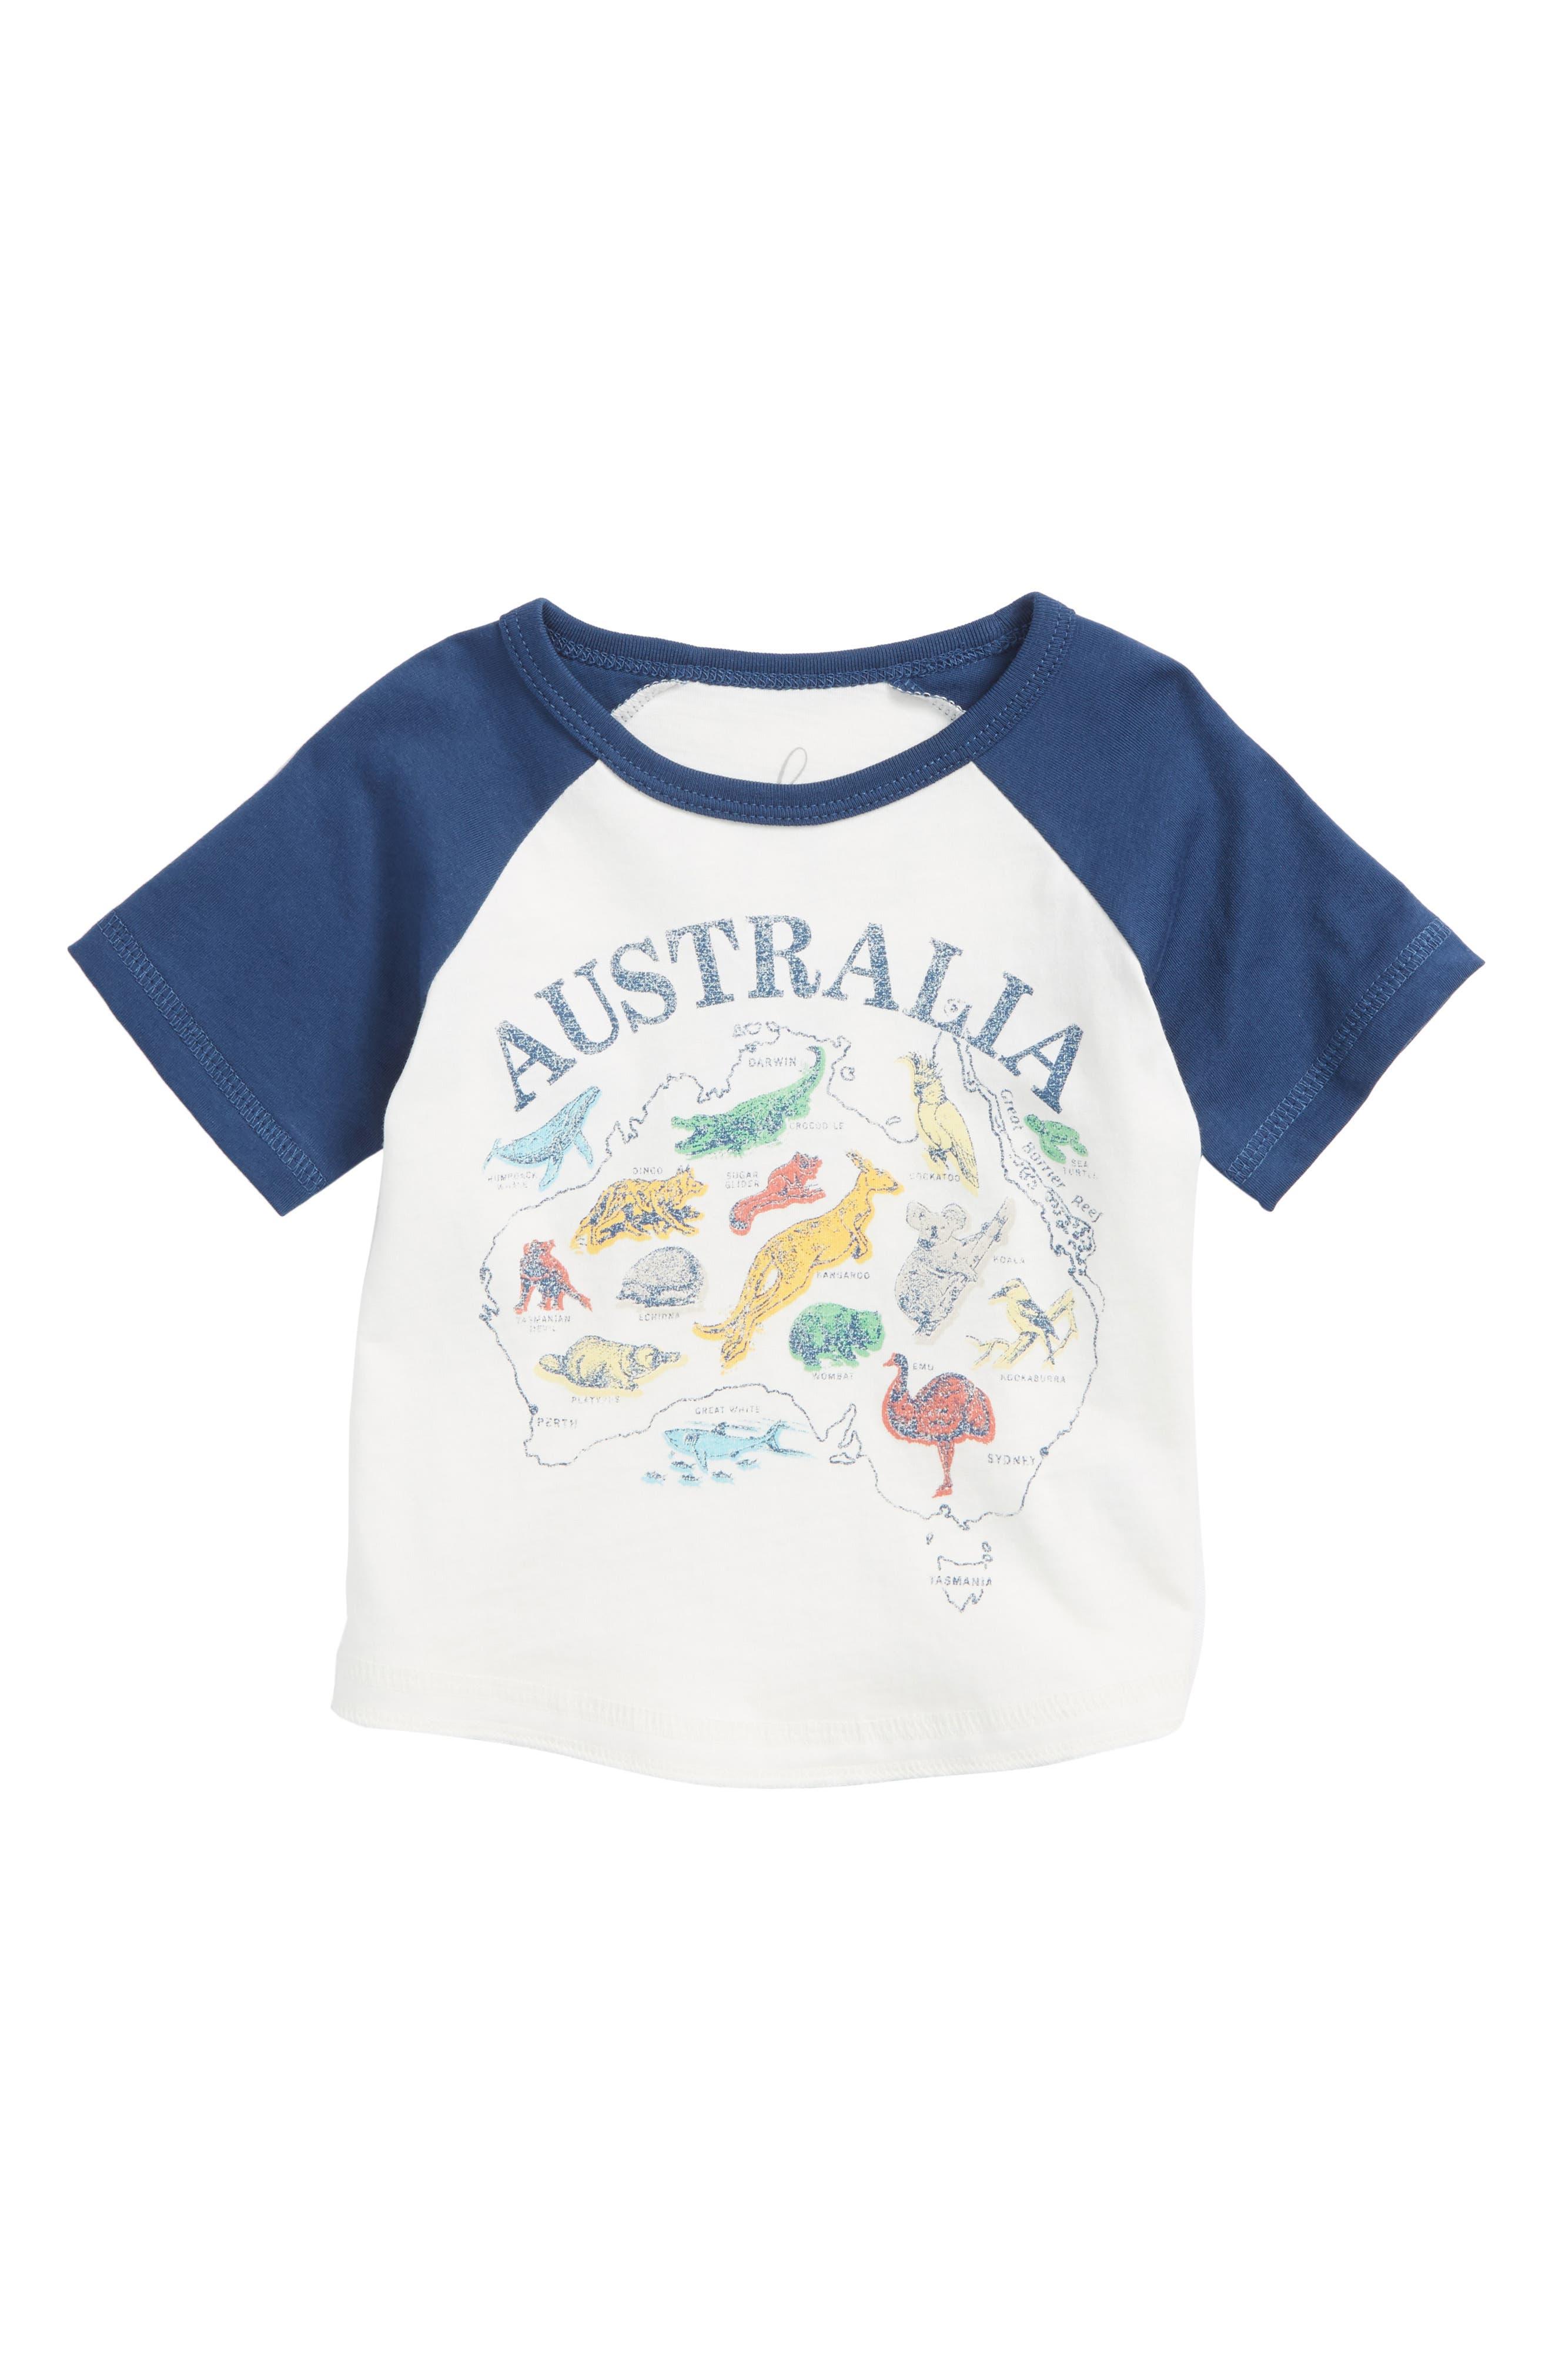 Australia Raglan T-Shirt,                             Main thumbnail 1, color,                             Ivory